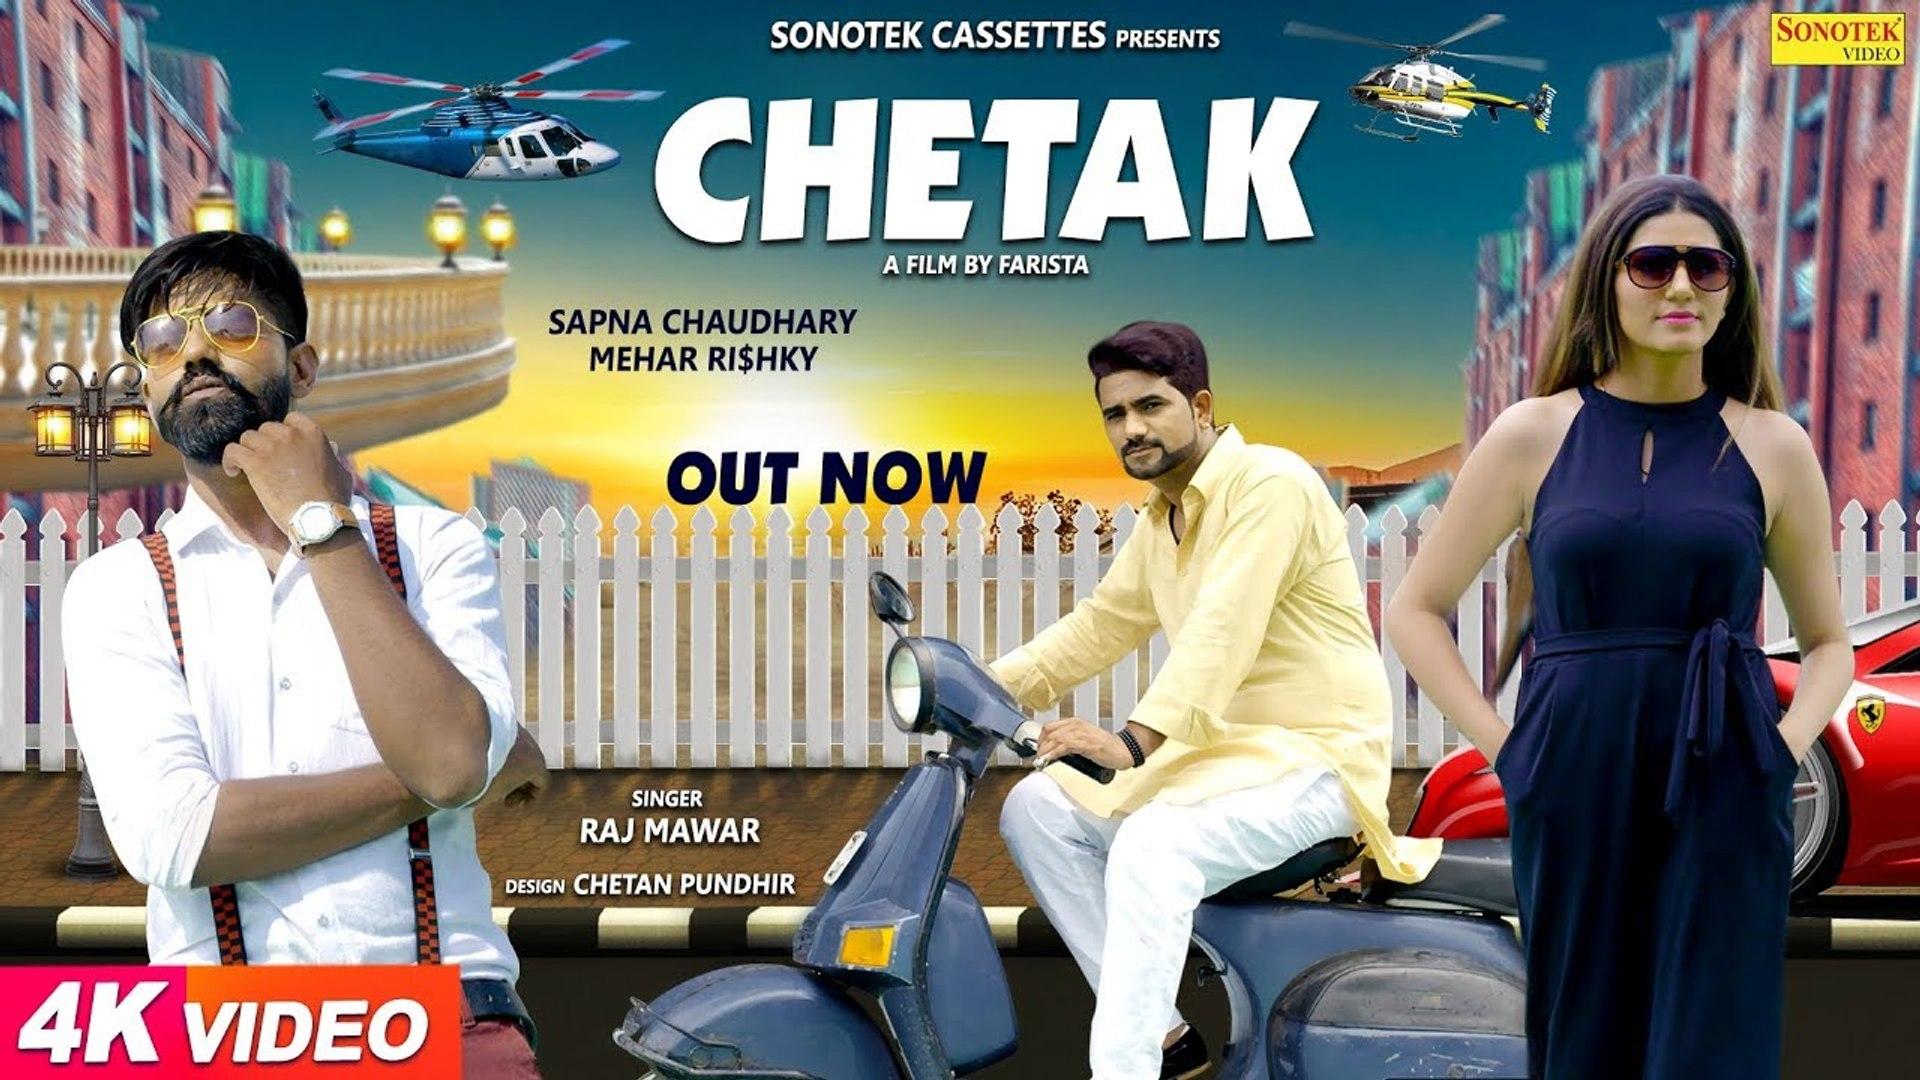 Yaar Tera Chetak Pe Chale _ Sapna Chaudhary _ Raj Mawar _ Mehar Risky _ New  Haryanvi Song 2018 - YouTube (720p)